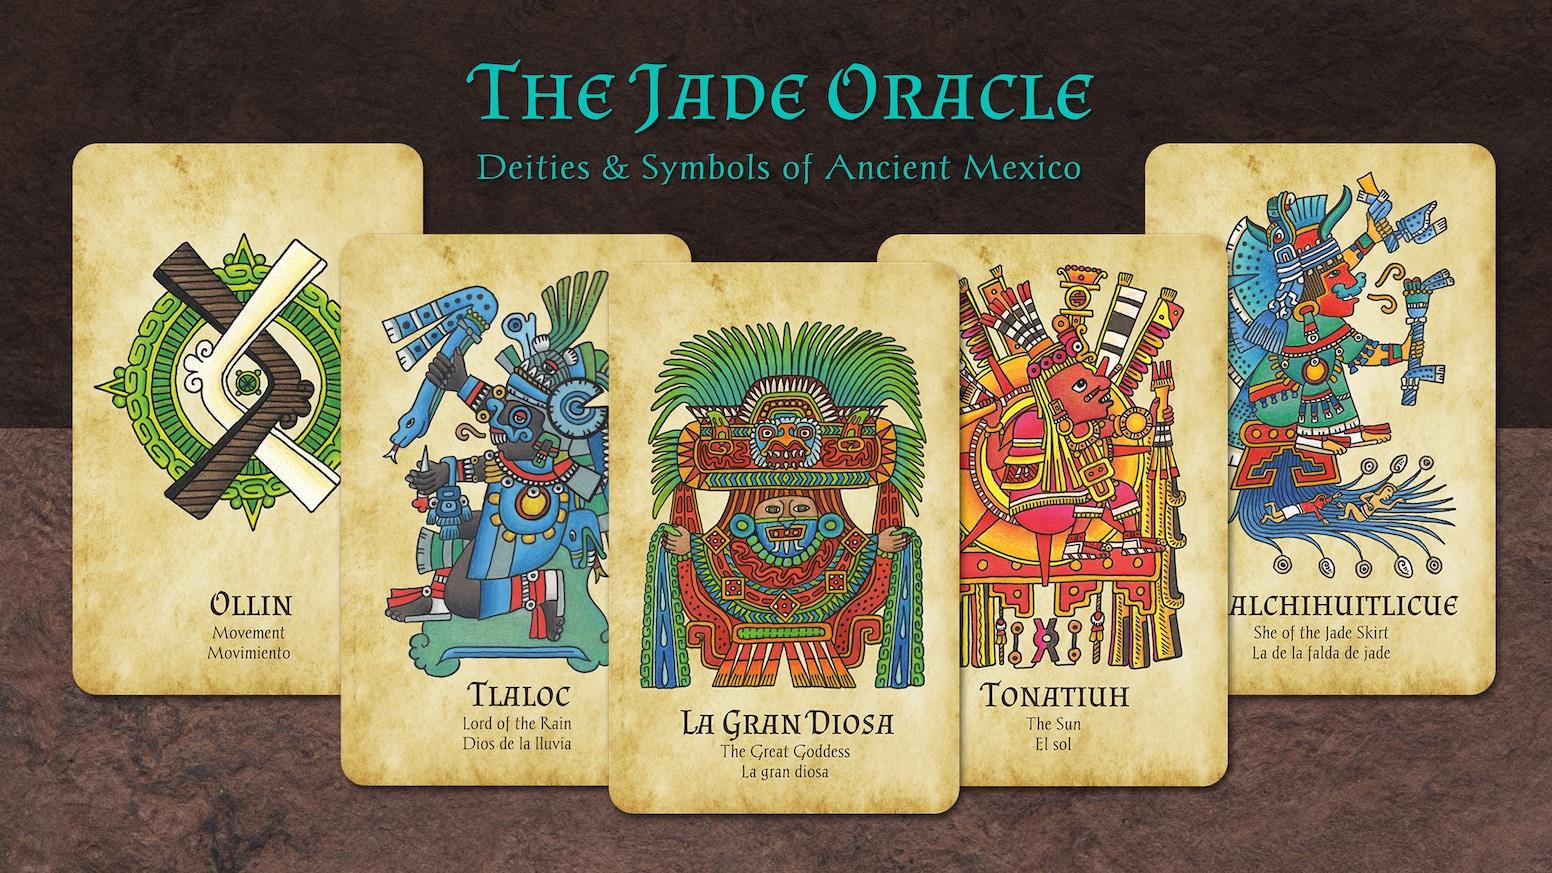 The jade oracle deities symbols of ancient mexico by ramona teo the jade oracle deities symbols of ancient mexico biocorpaavc Gallery